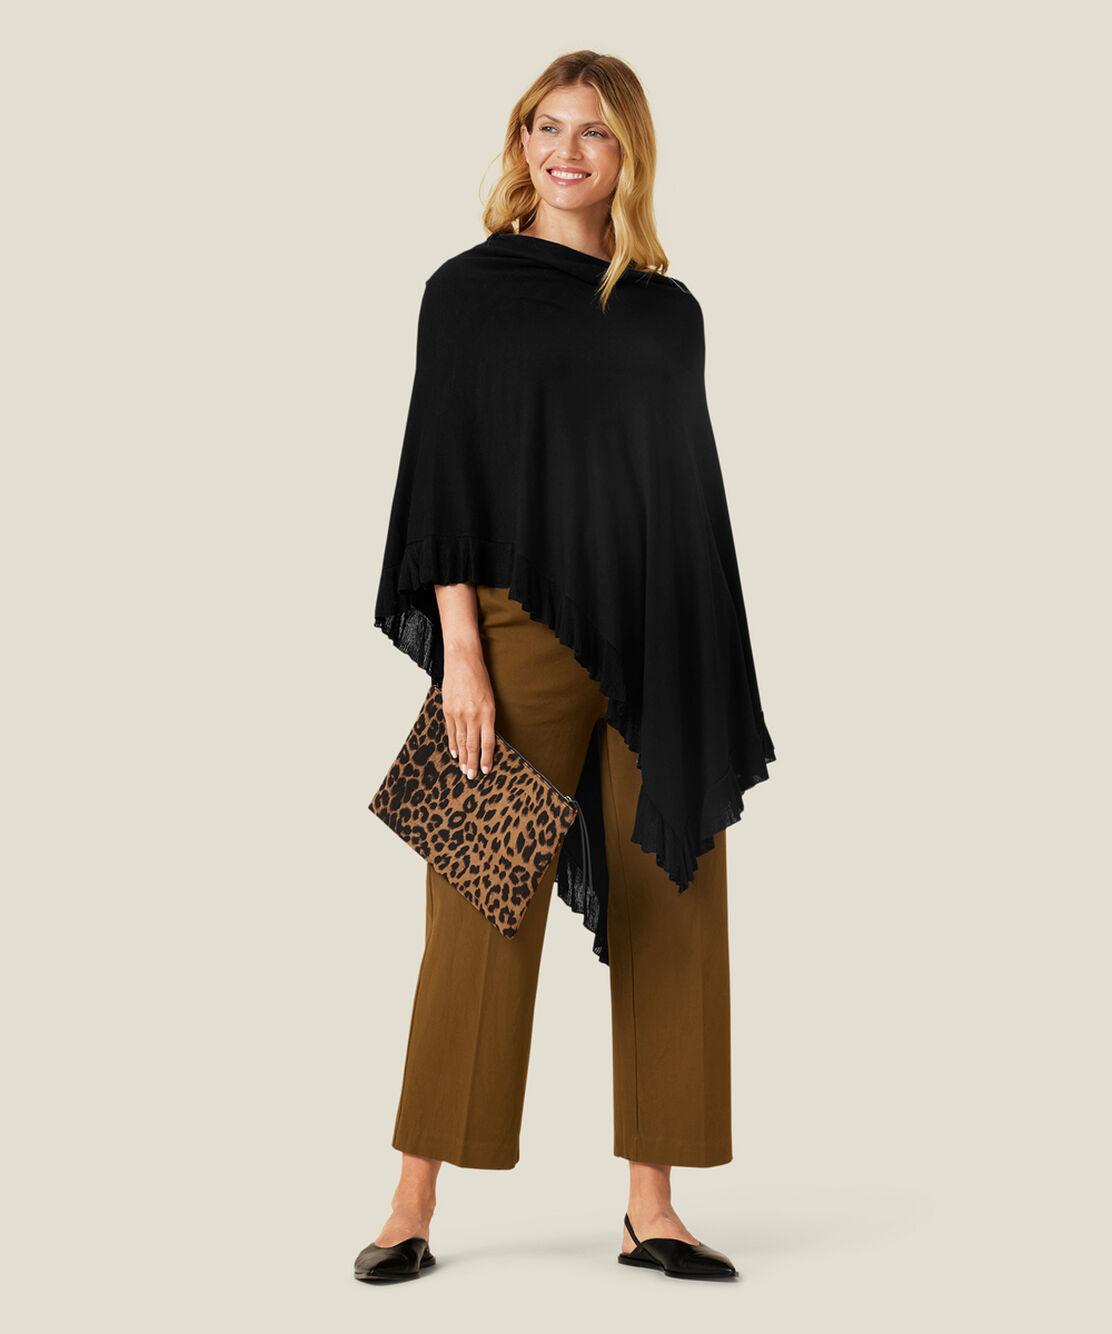 PETIA BYXOR, Monk's Robe, hi-res